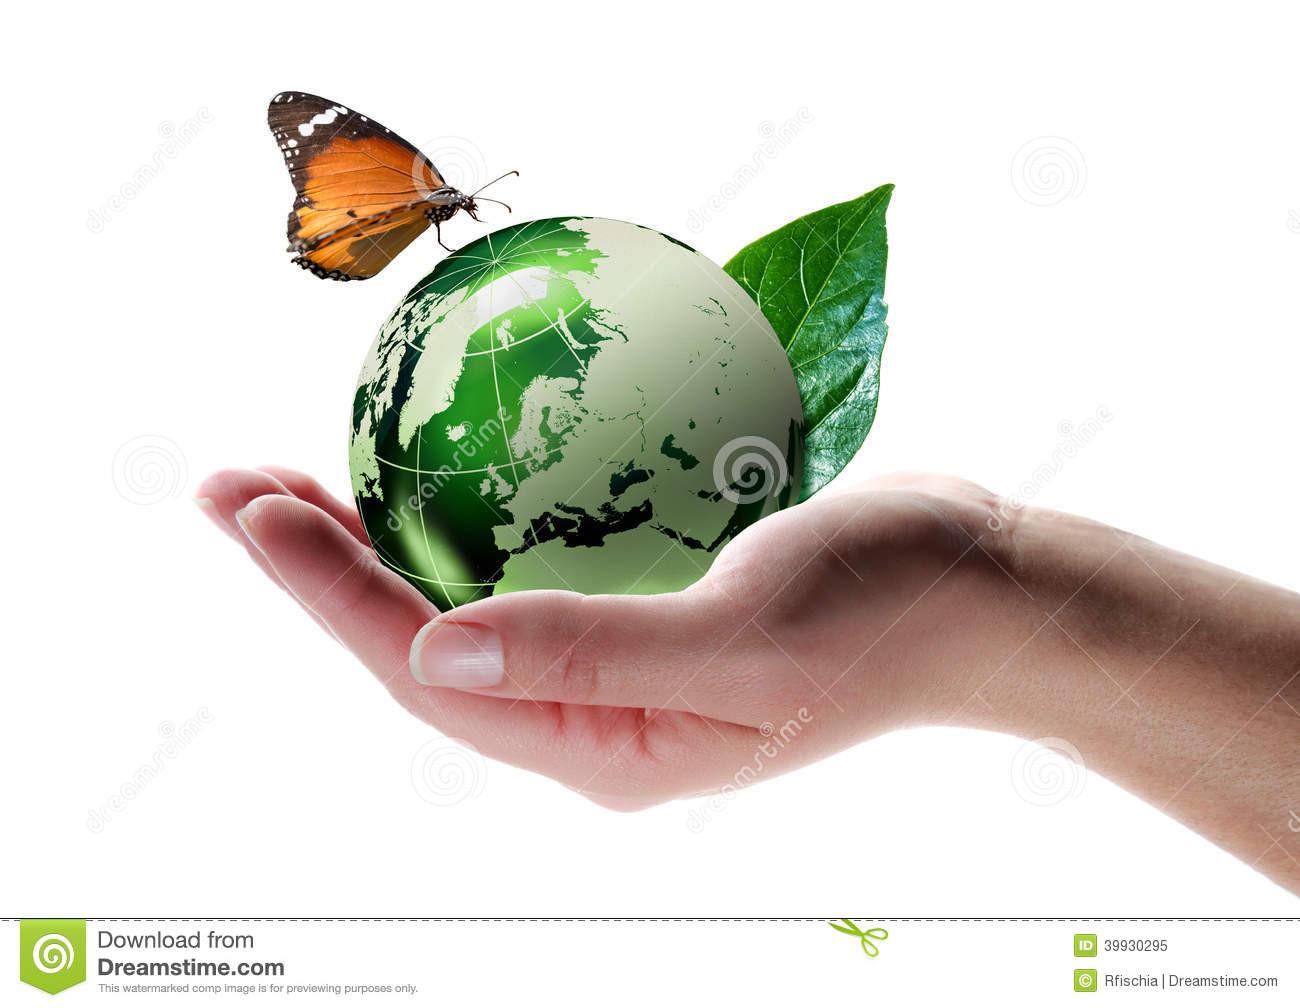 Respectes-tu l'environnement ?